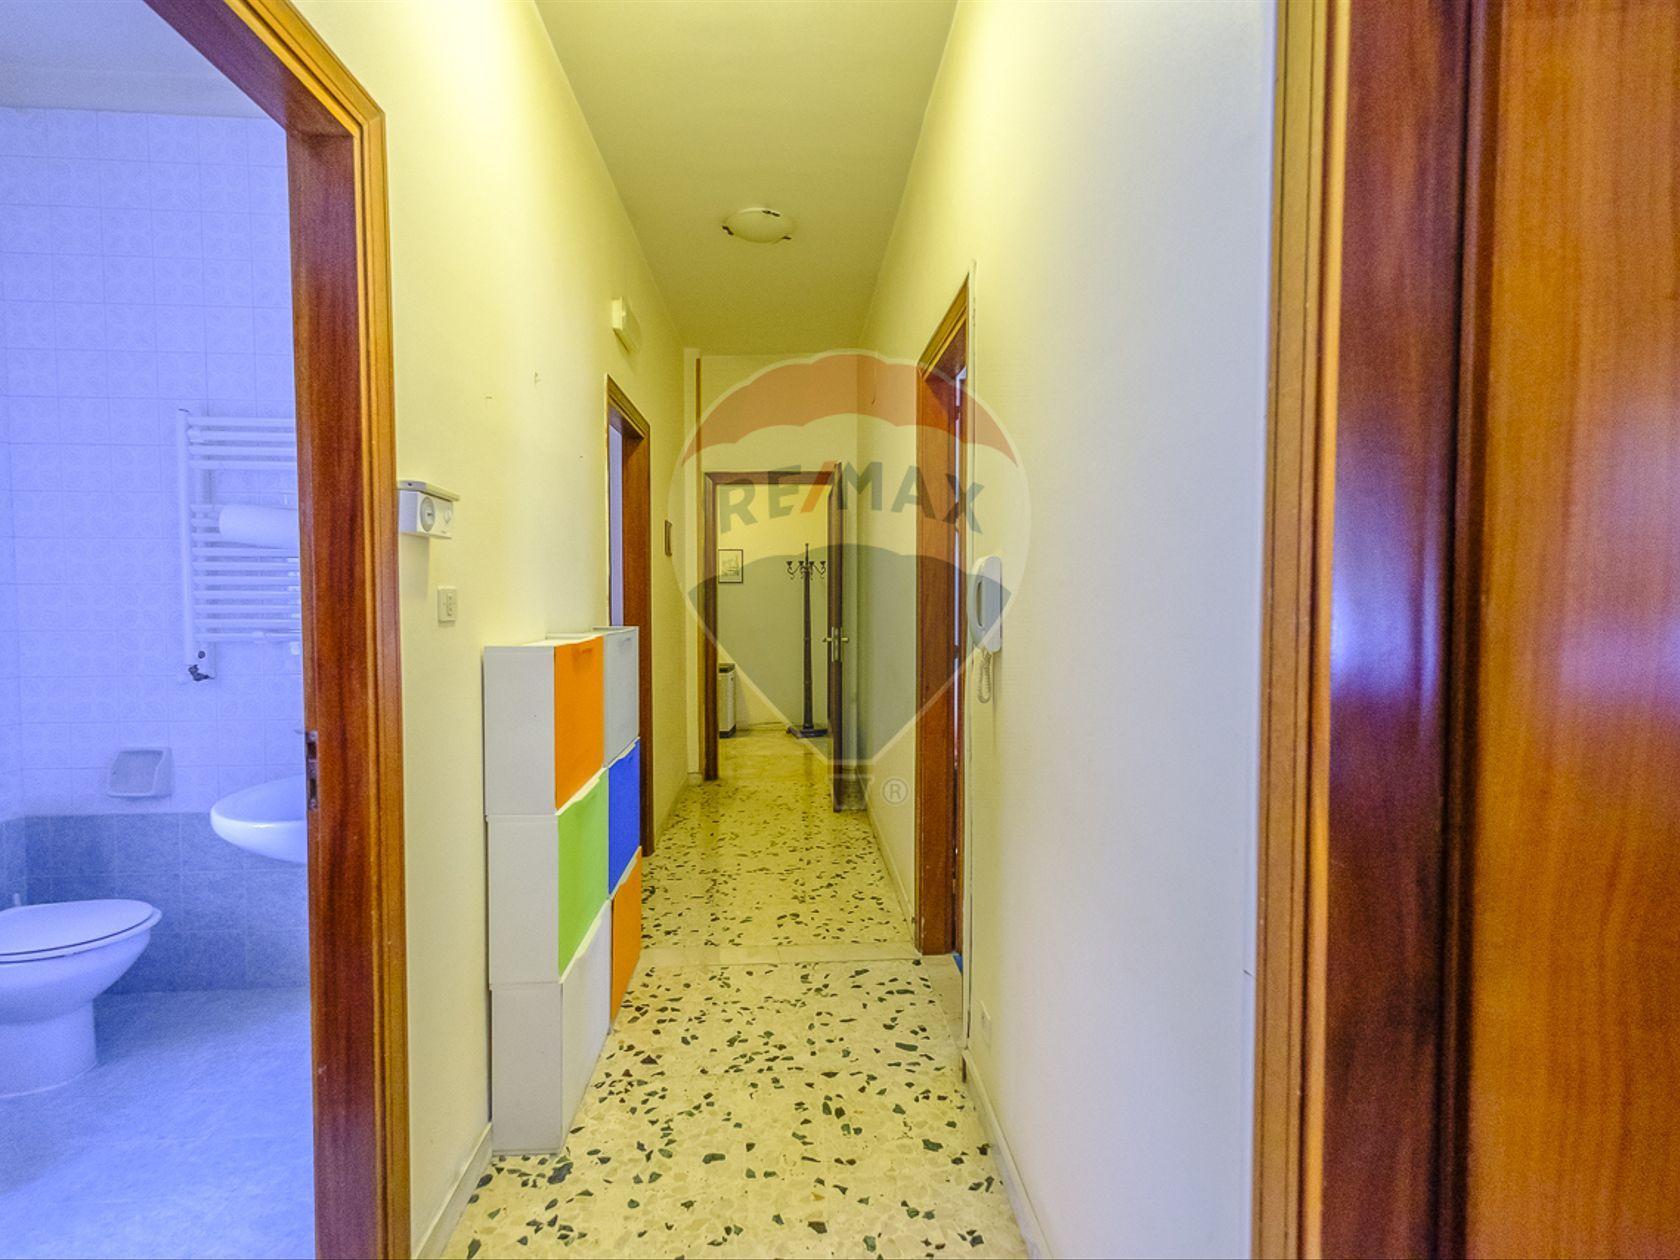 Appartamento Siracusa- Scala Greca S. Panagia Teracati Zecchino, Siracusa, SR Vendita - Foto 21